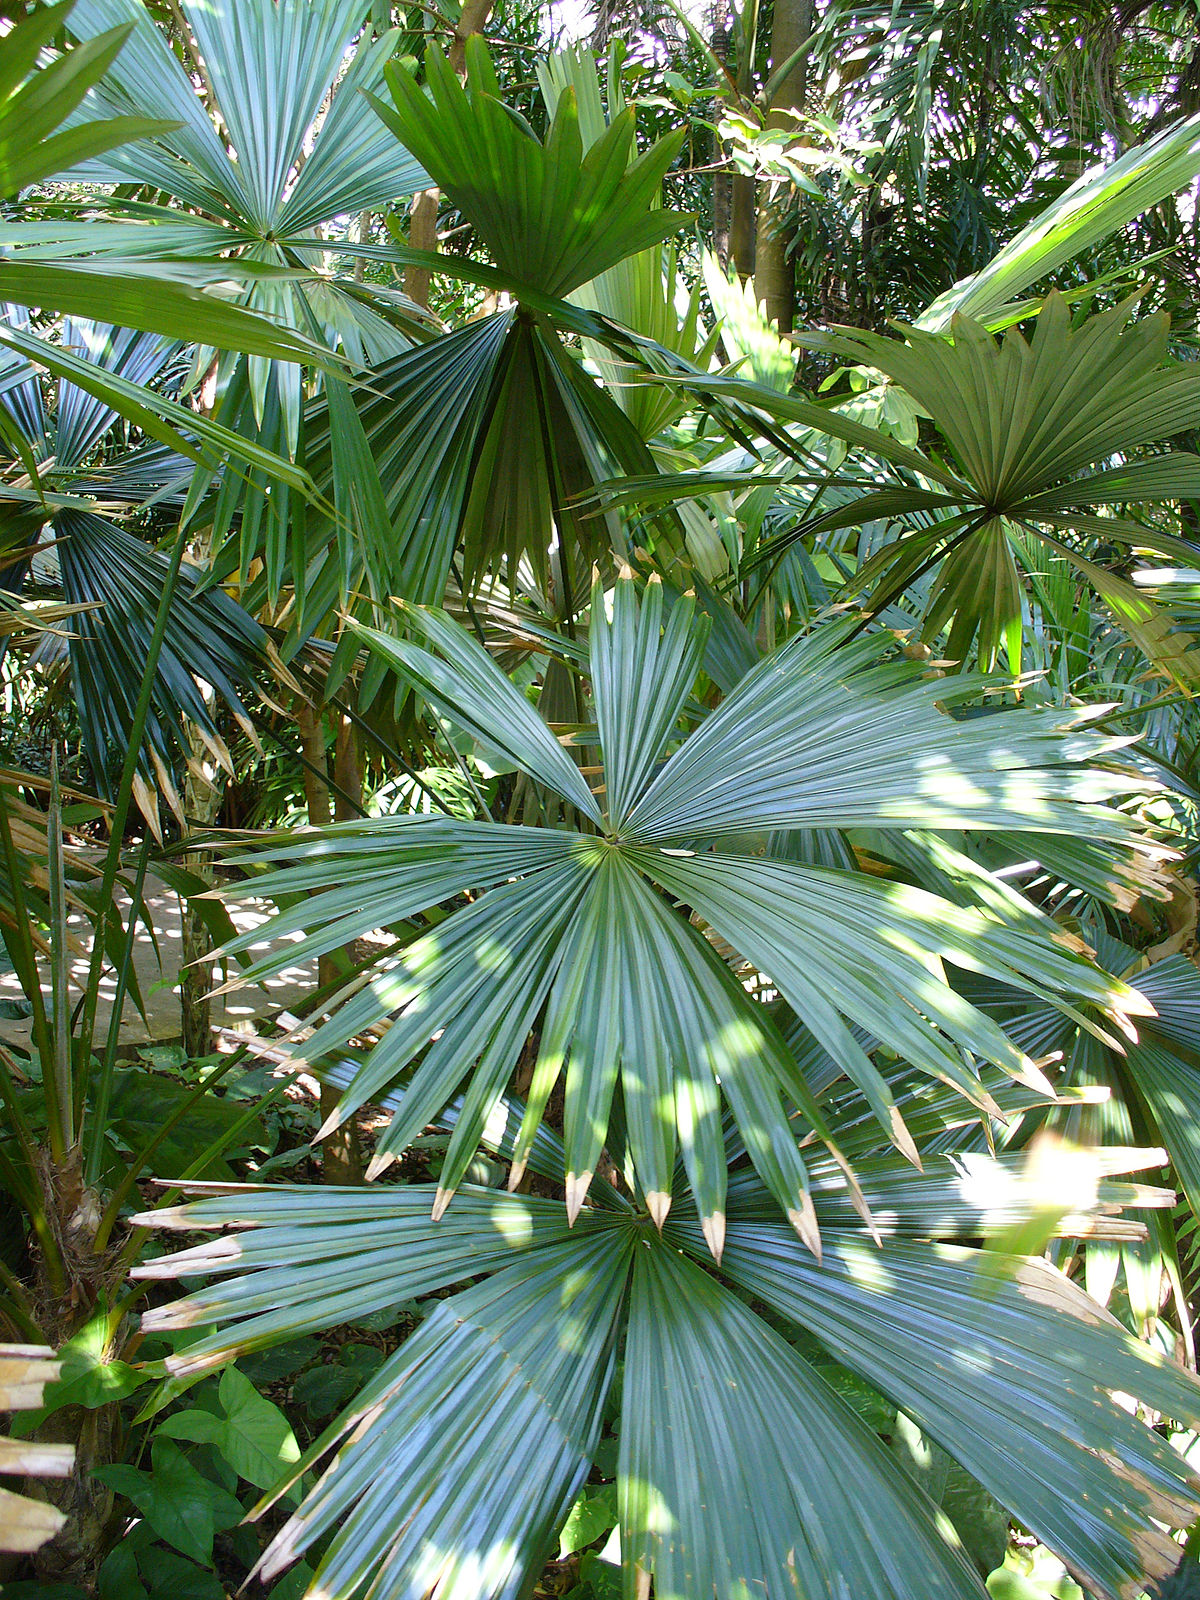 Chelyocarpus  Wikipedia